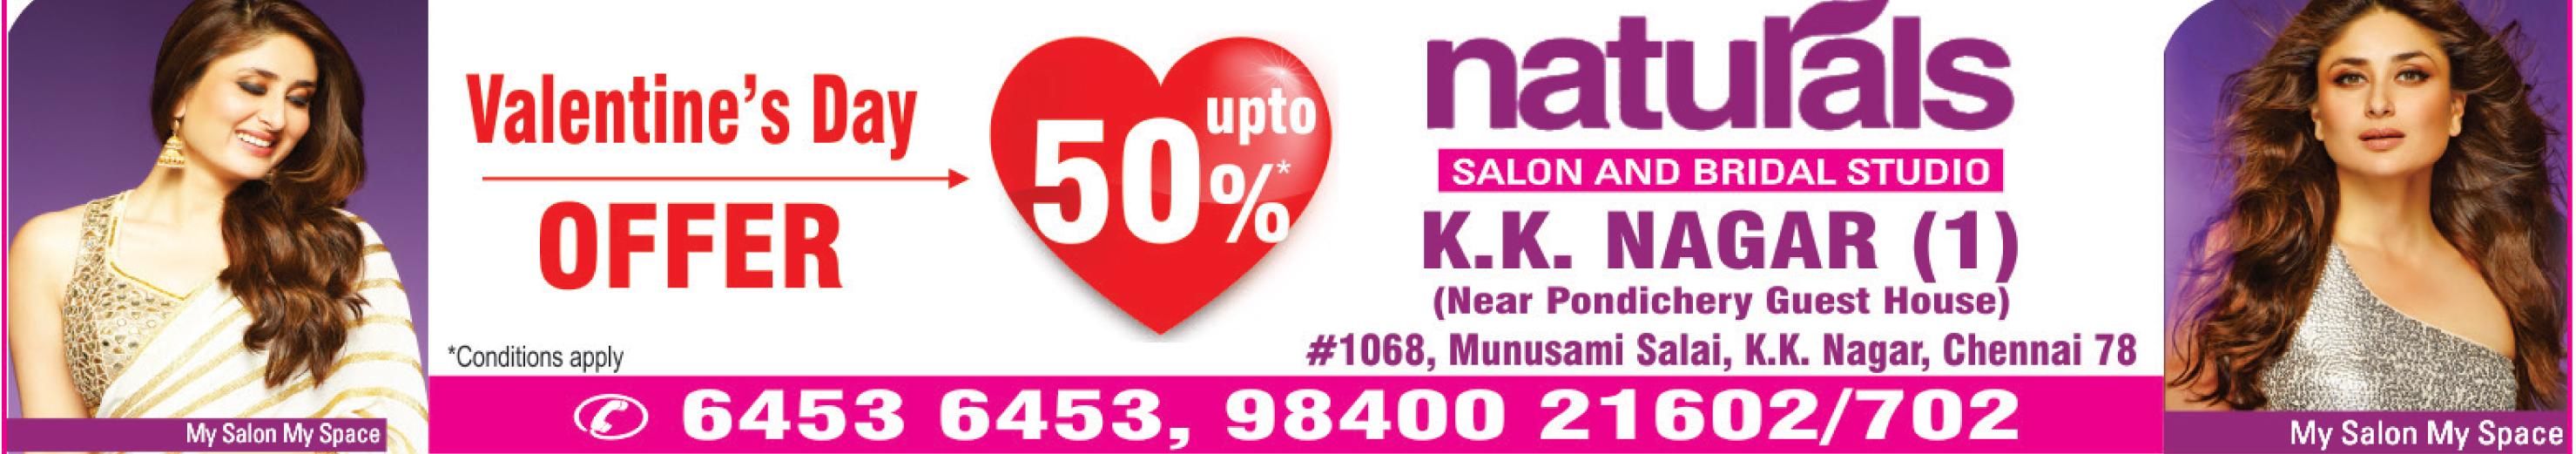 Naturals-K.K.Nagar